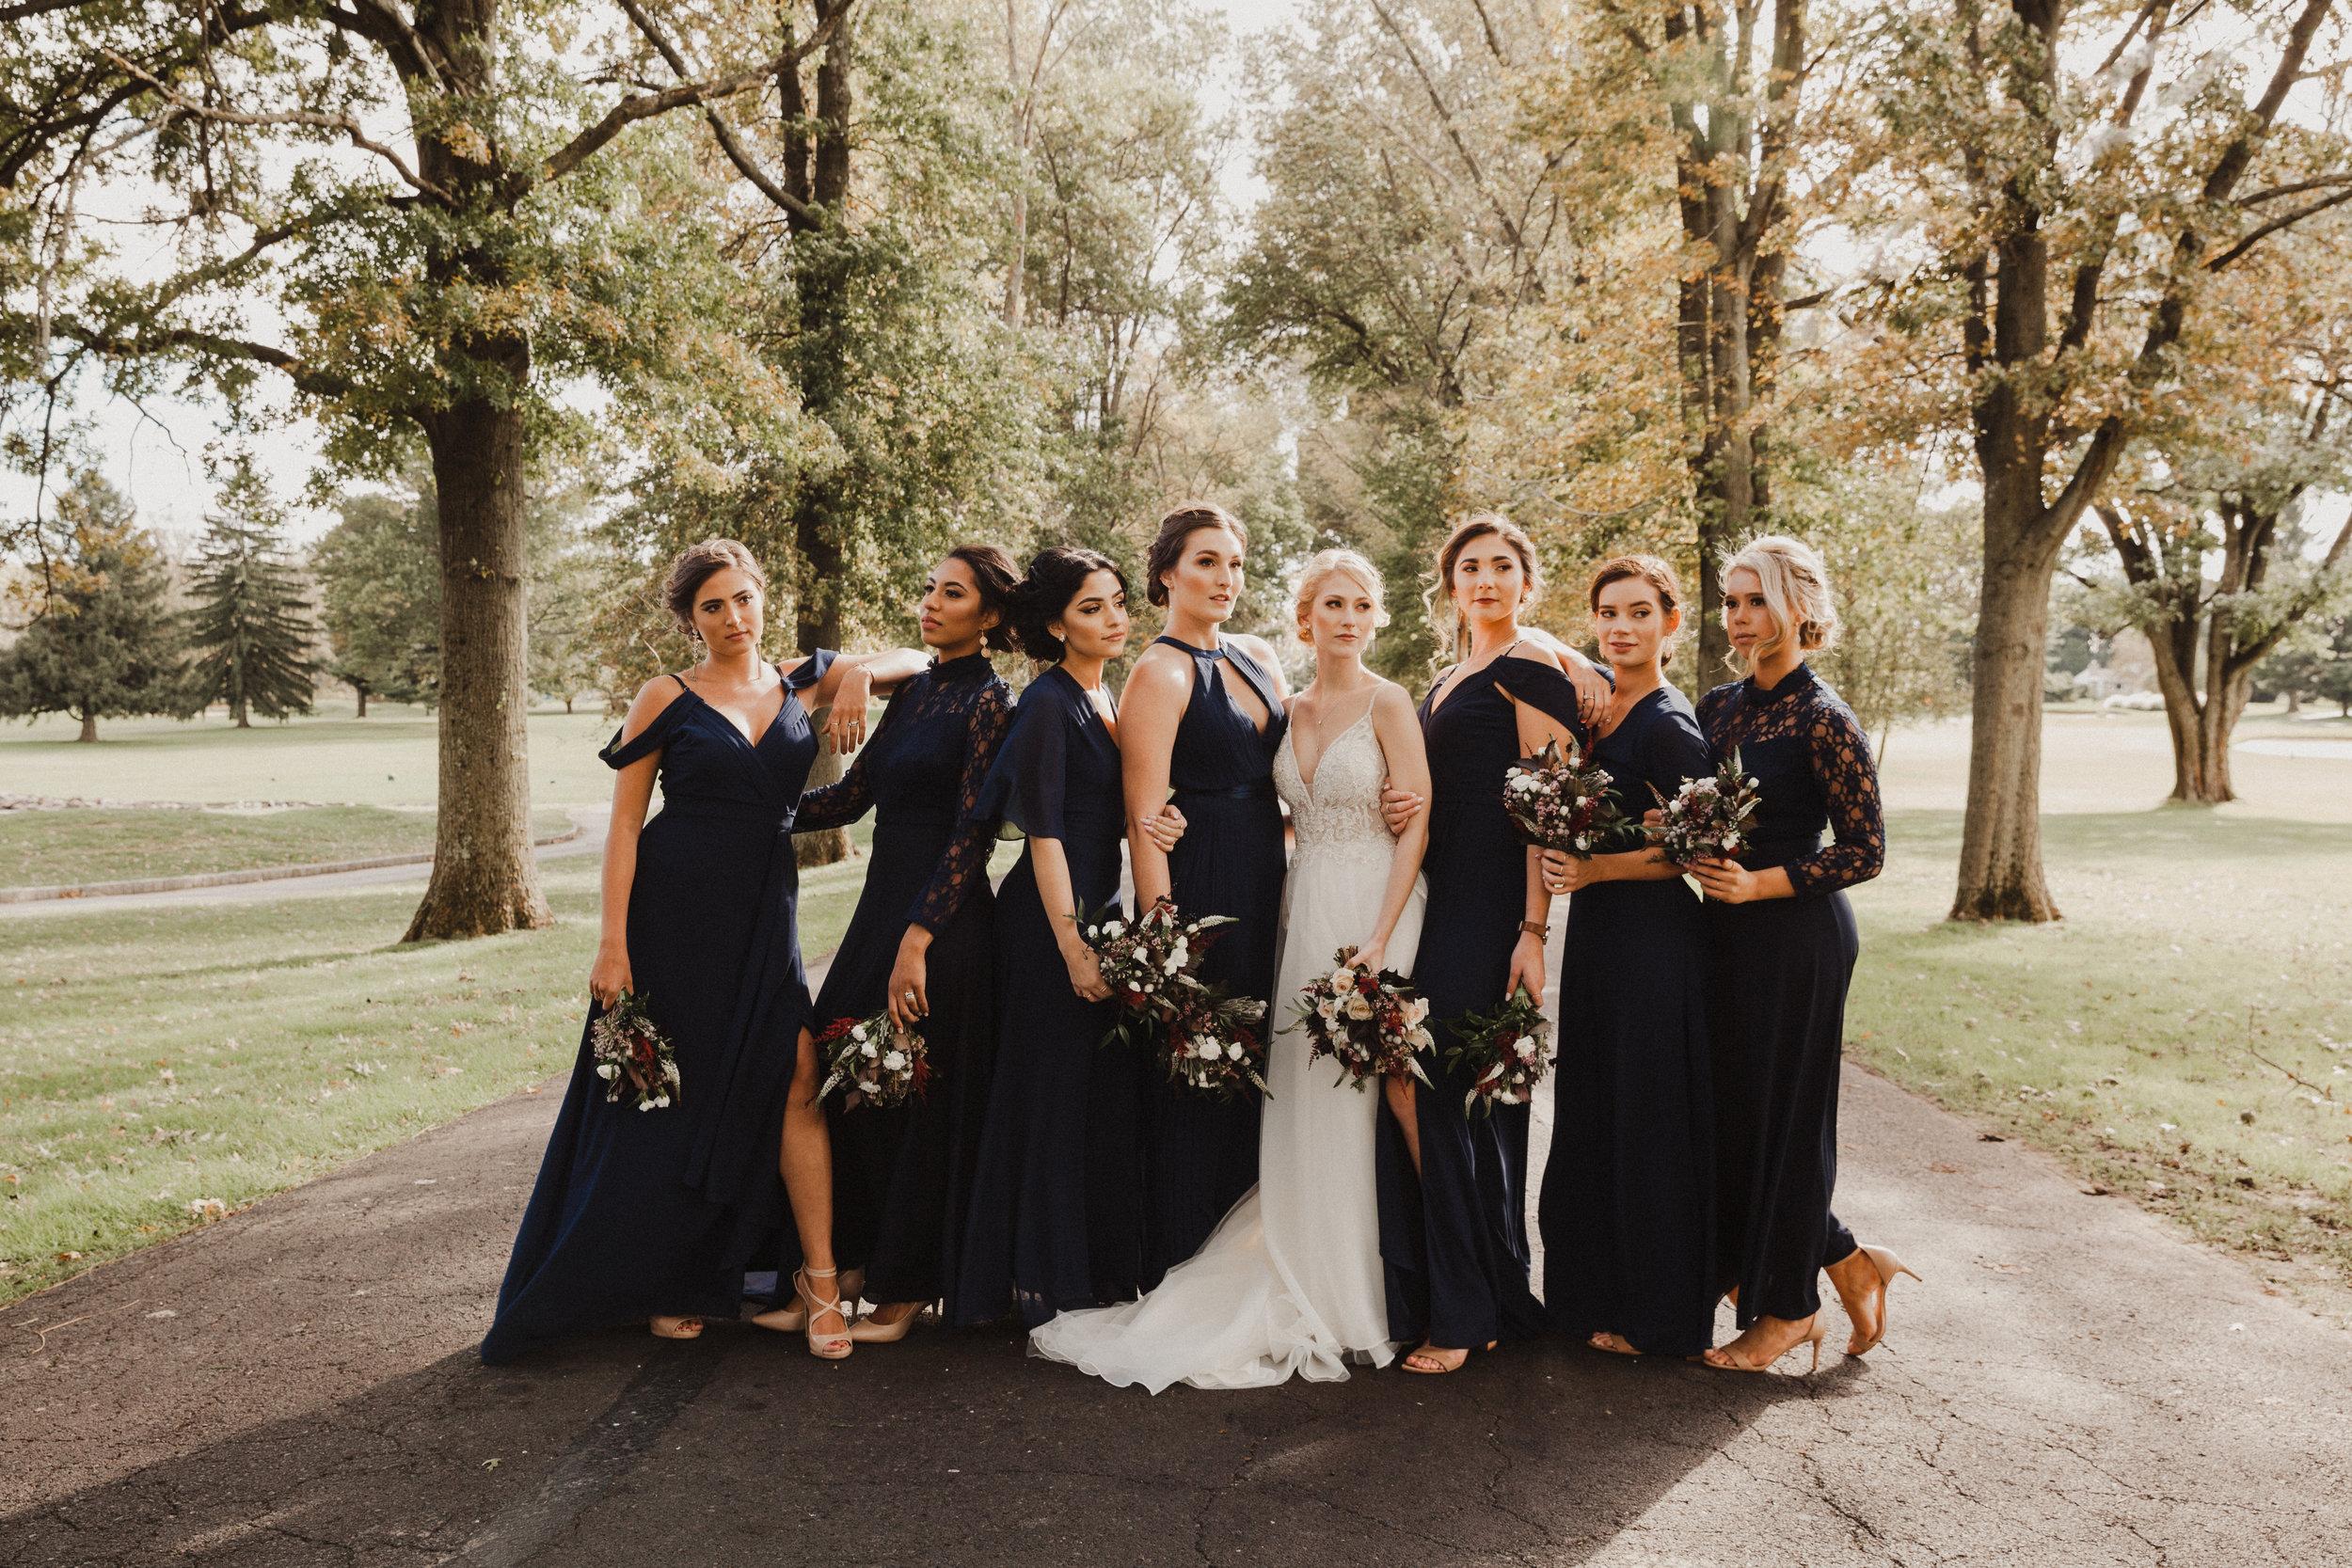 dotw_wedding_graziano-3748.jpg